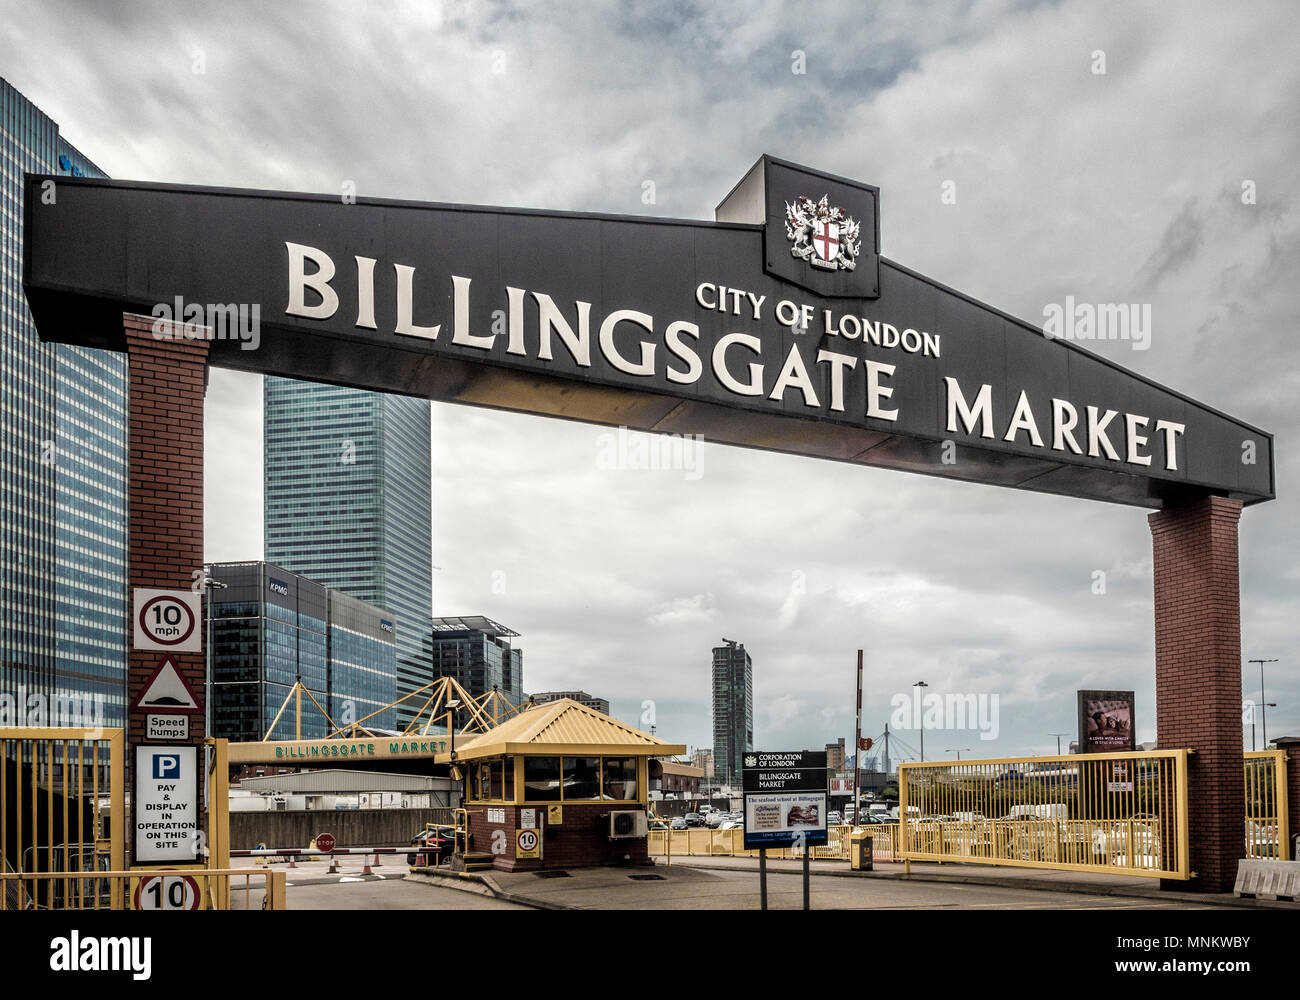 Billingsgate Market, Poplar, Isle of Dogs, London, UK. - Stock Image